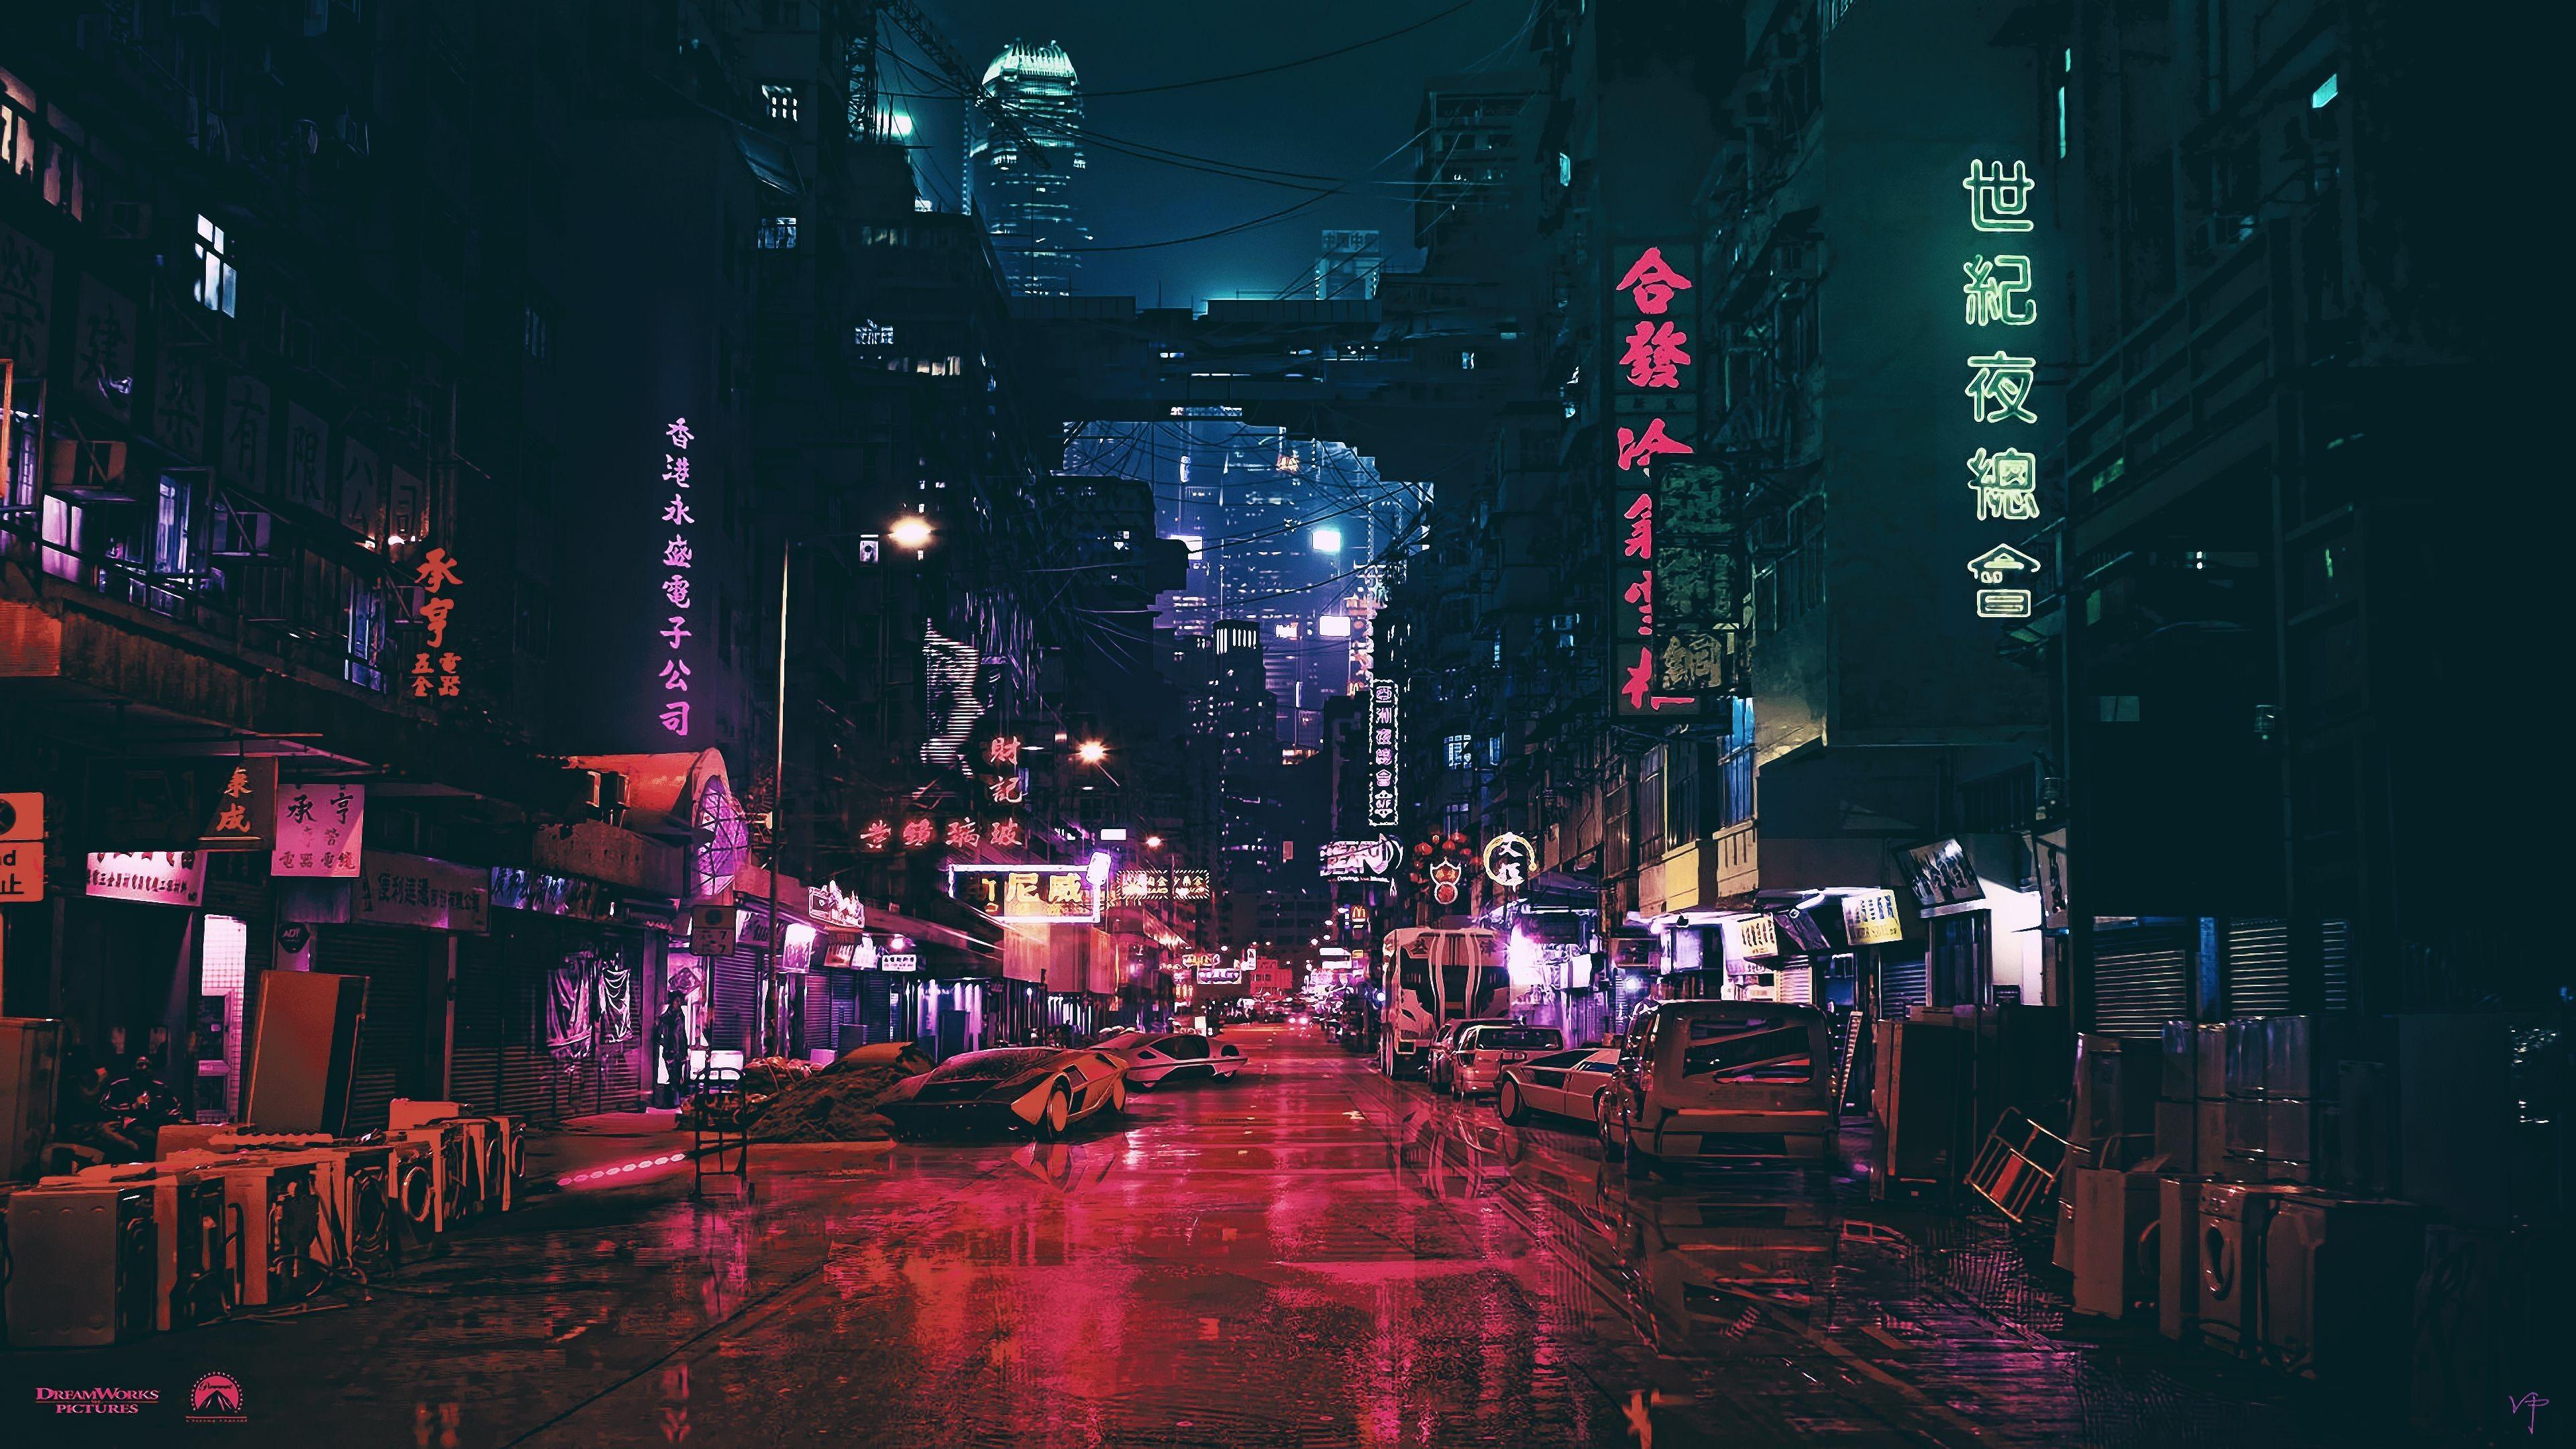 Elegant Cyberpunk Wallpaper Hd Di 2020 Wallpaper Iphone Seni Gambar